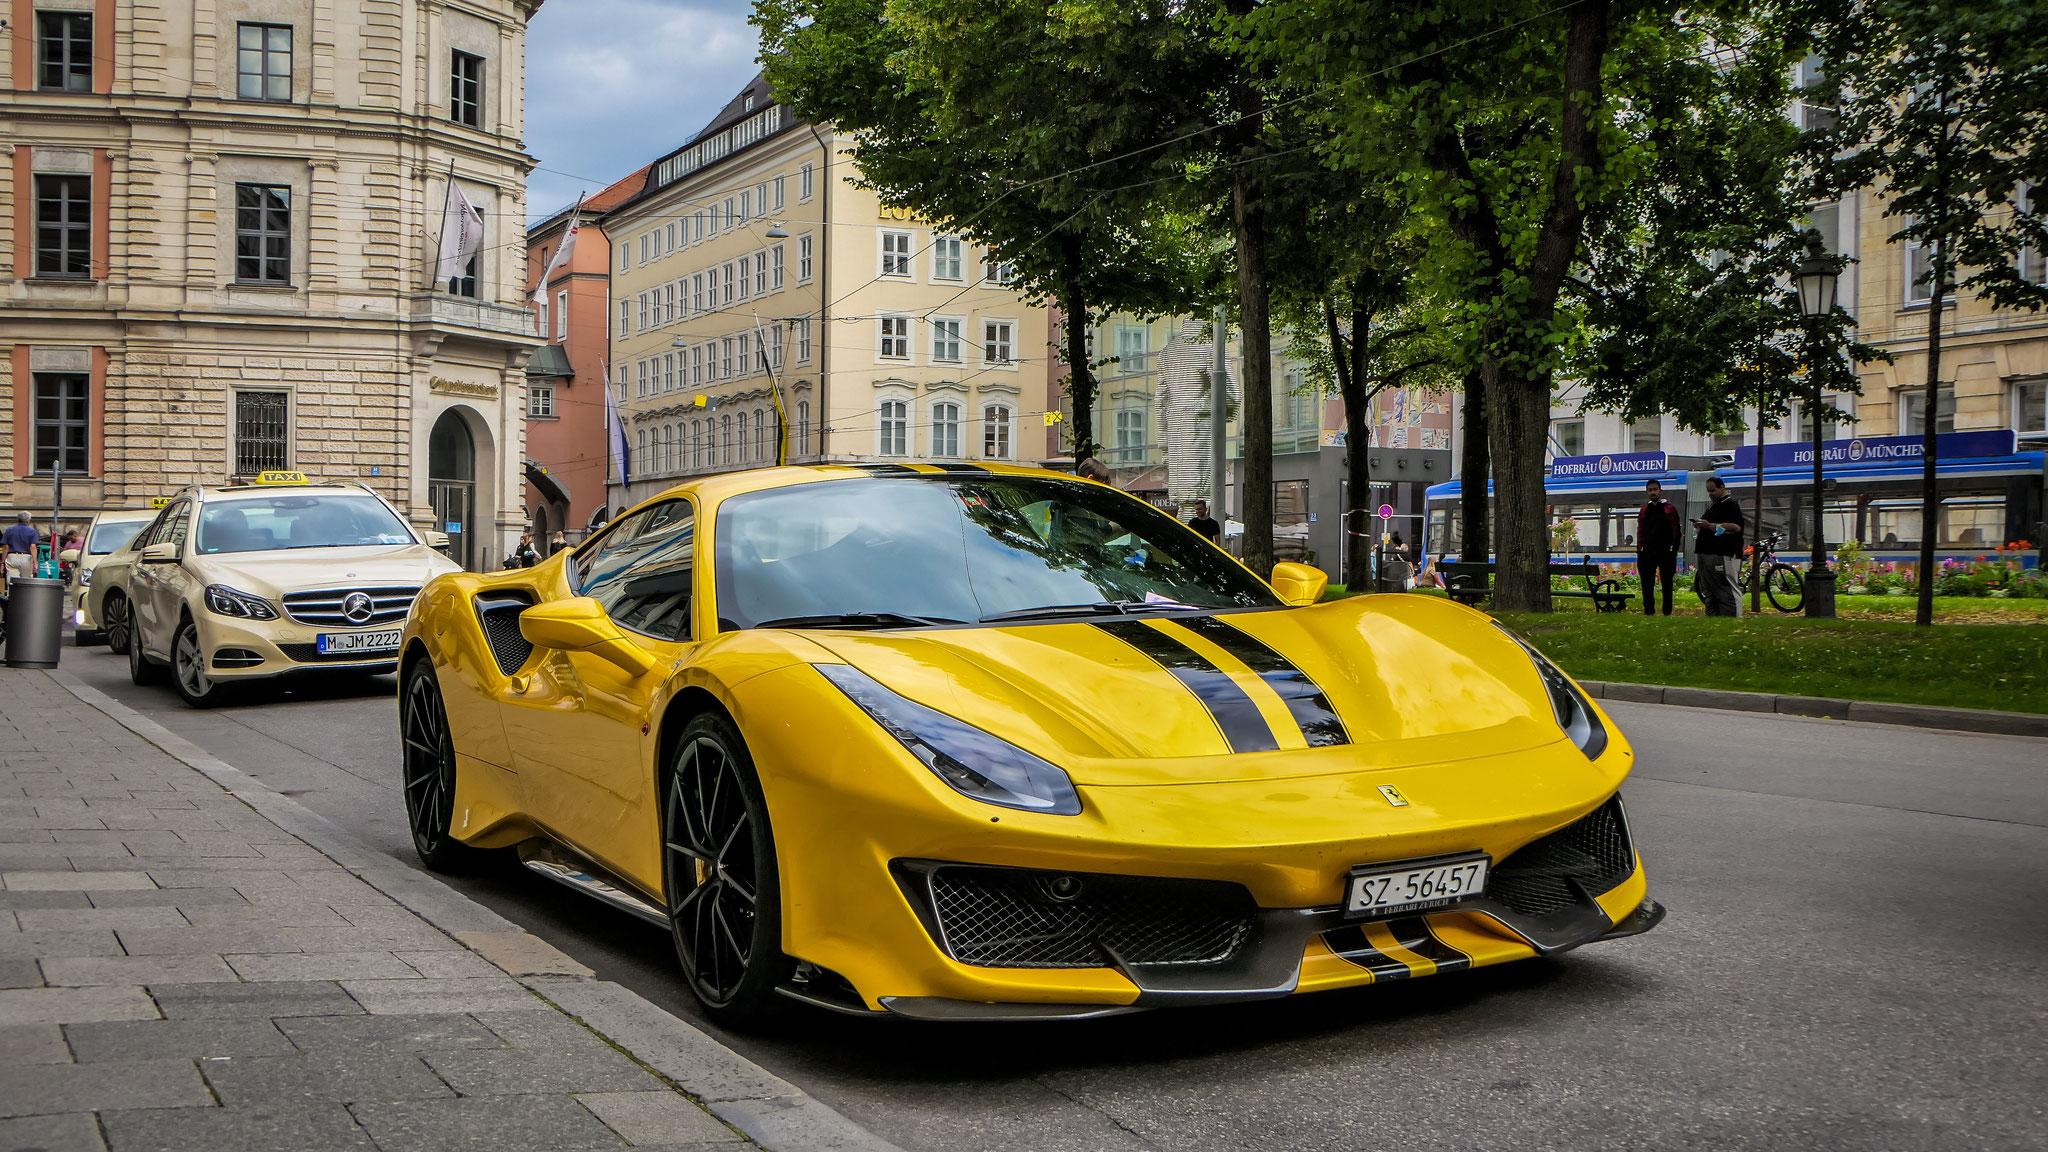 Ferrari 488 Pista - SZ-56457 (CH)